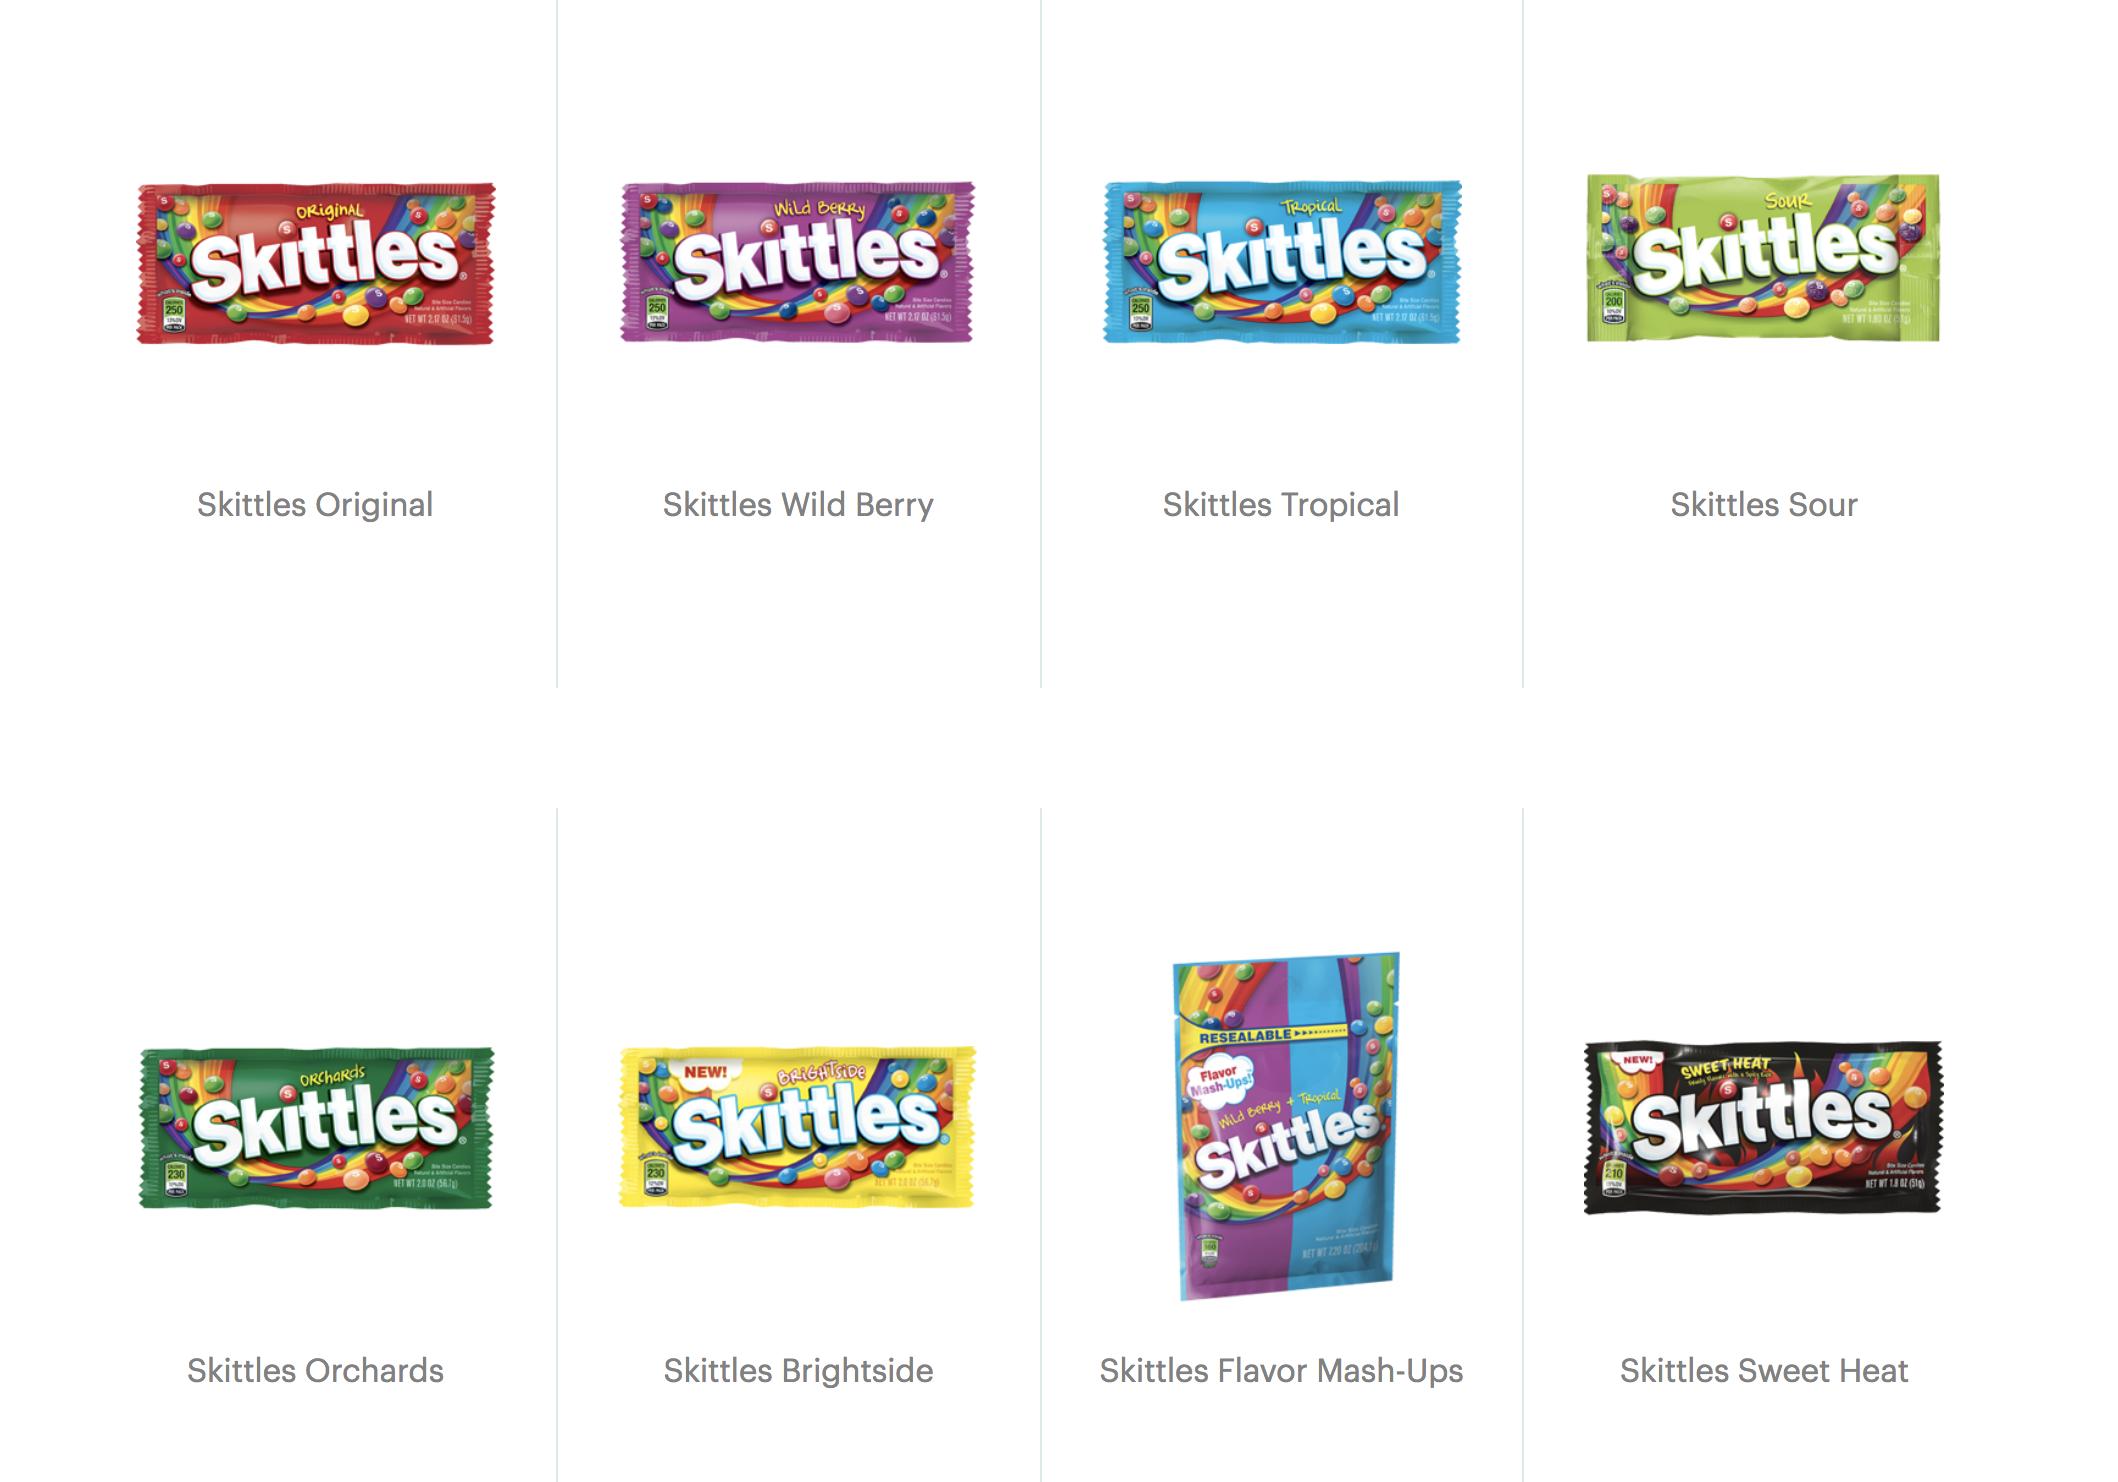 skittles flavors